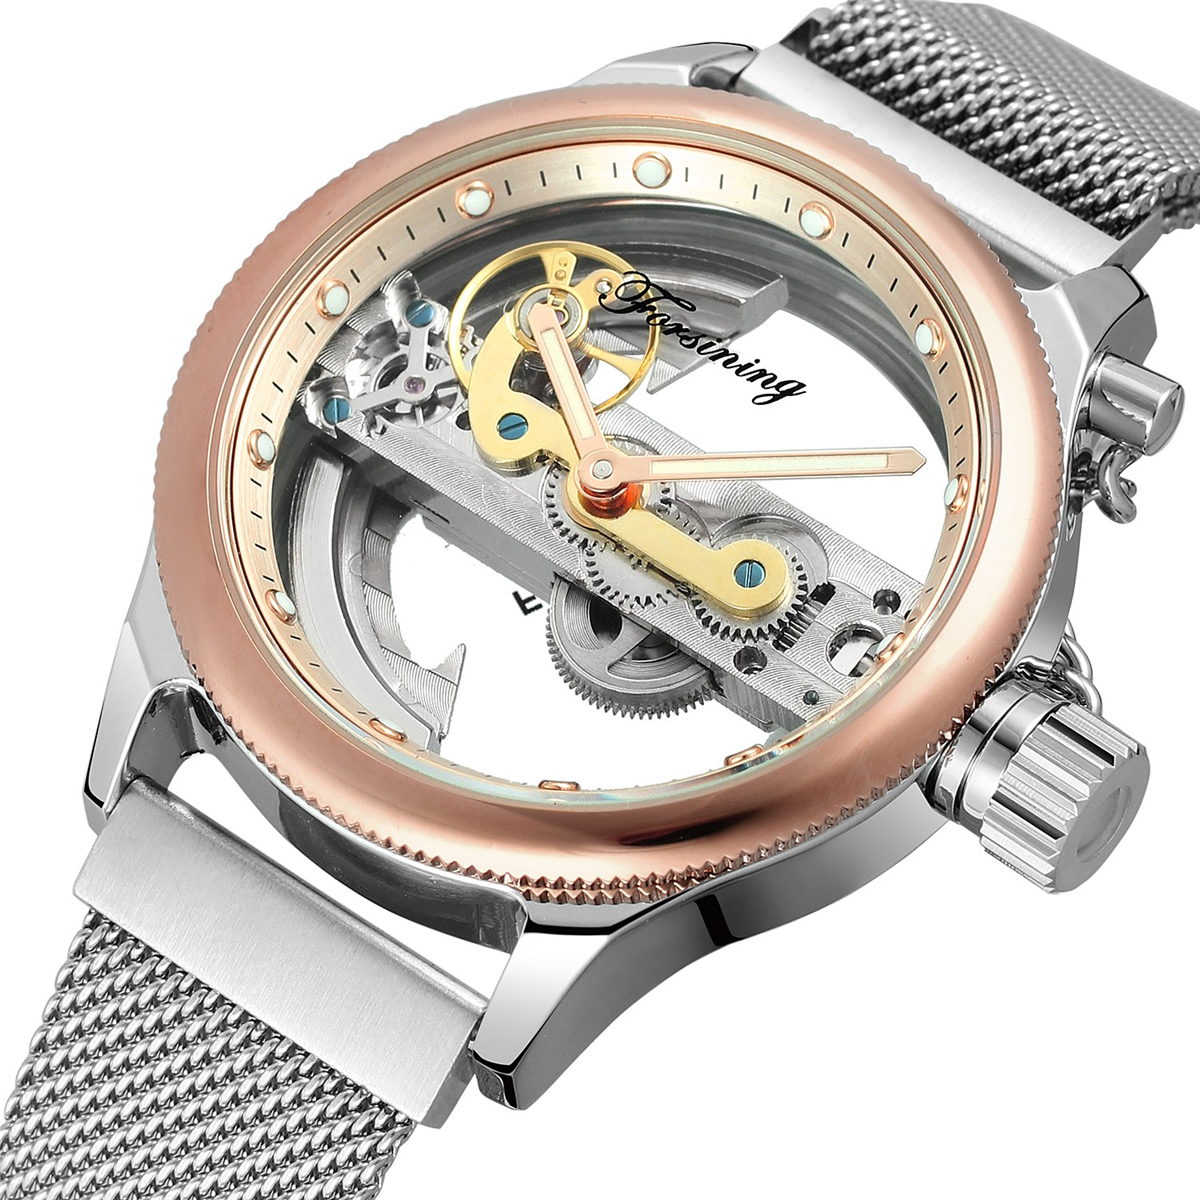 все цены на Forsining 2018 Fashion Casual Neutral Design Silver Steel Transparent Case Skeleton Watch Mens Watch Top Brand Luxury Mechanical онлайн